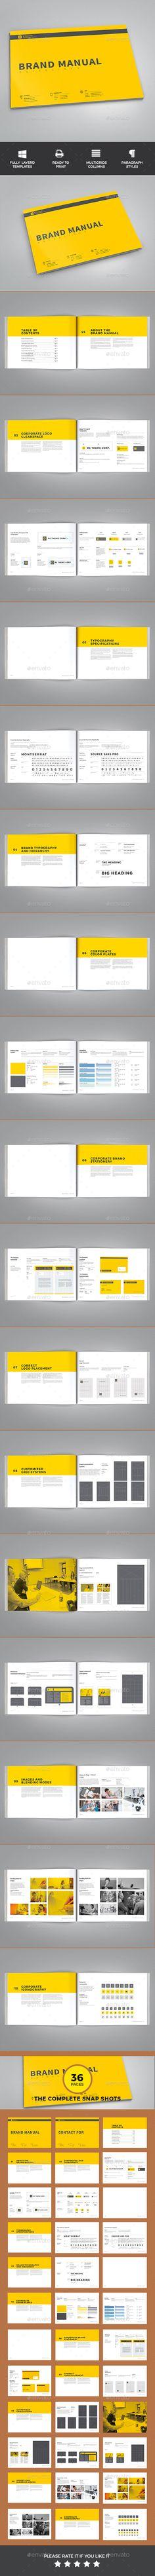 Brand Manual Template InDesign INDD #design Download: http://graphicriver.net/item/brand-manual/14229420?ref=ksioks